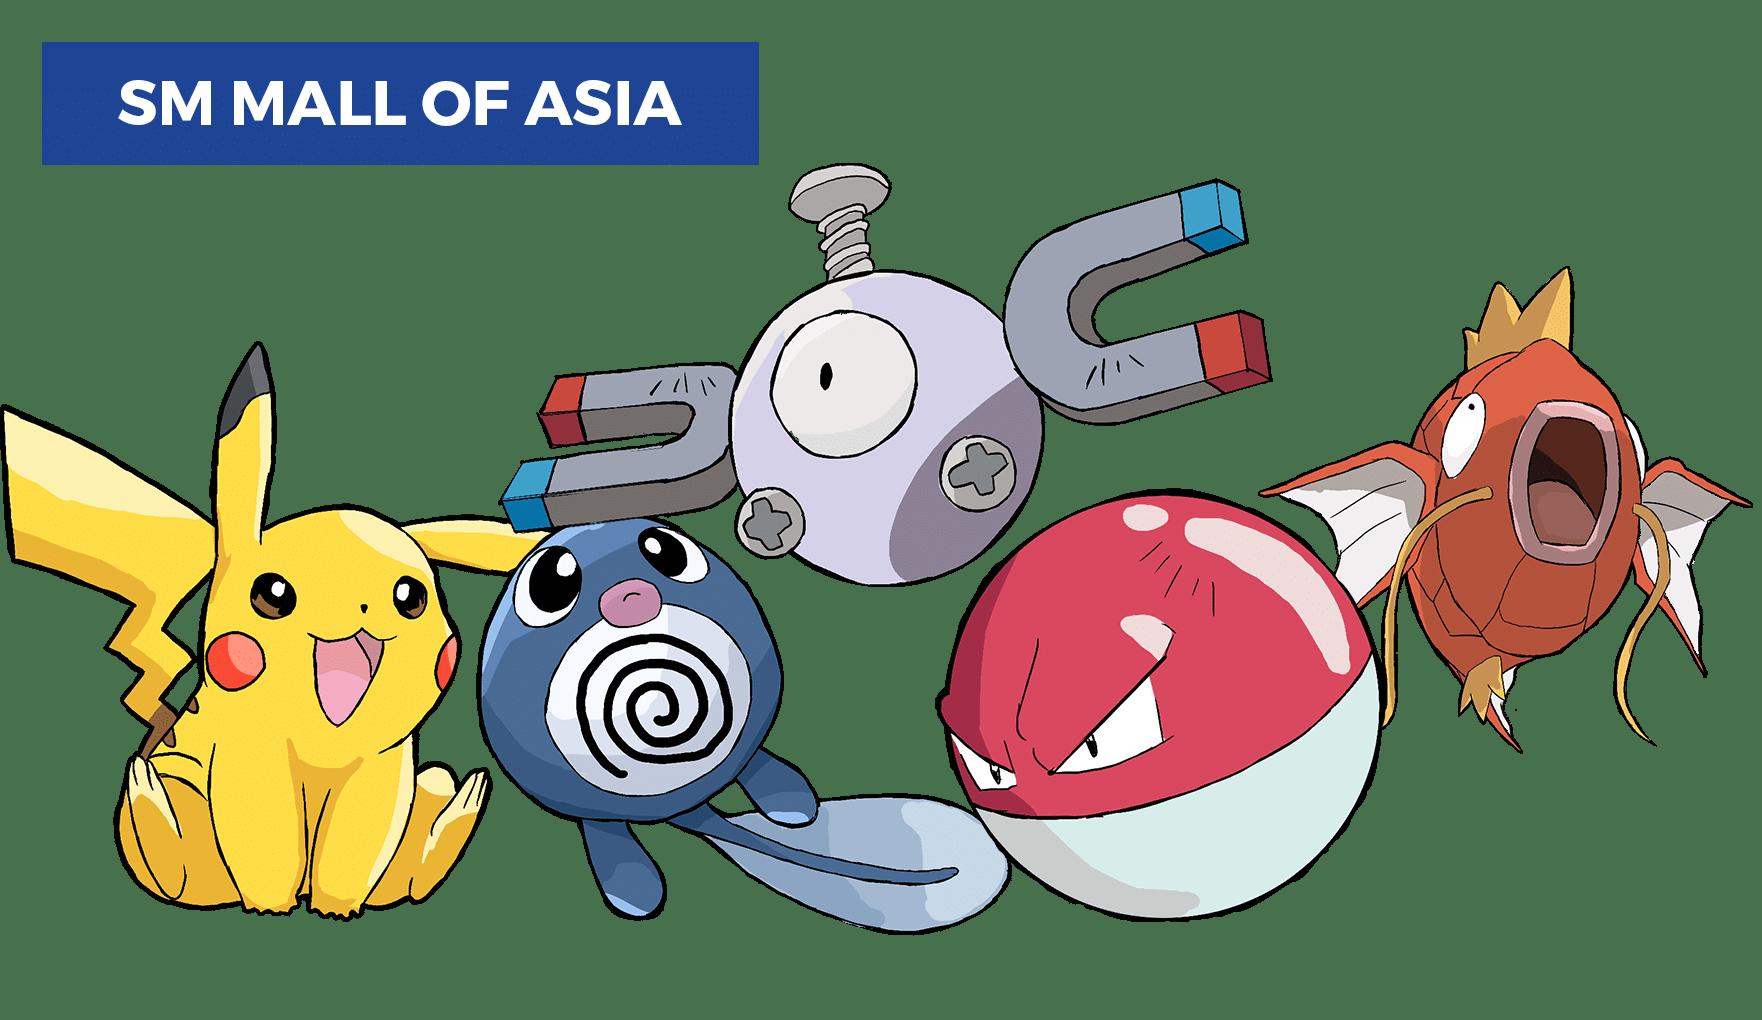 best pokemon go locations in manila - sm mall of asia